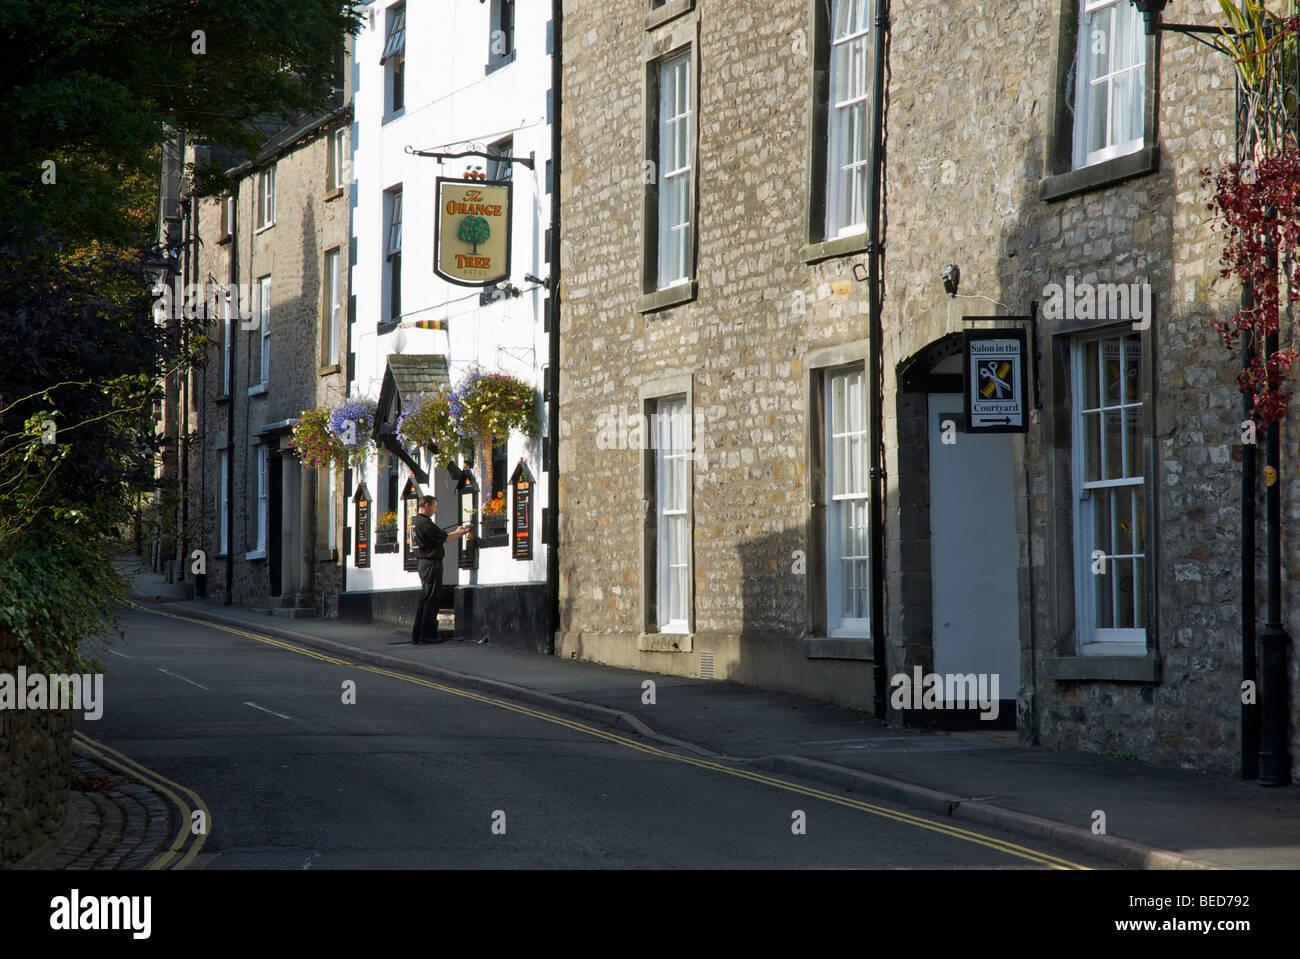 Man changing the menu outside the Orange Tree Hotel, Fairbank, Kirkby Lonsdale, Cumbria, England UK - Stock Image